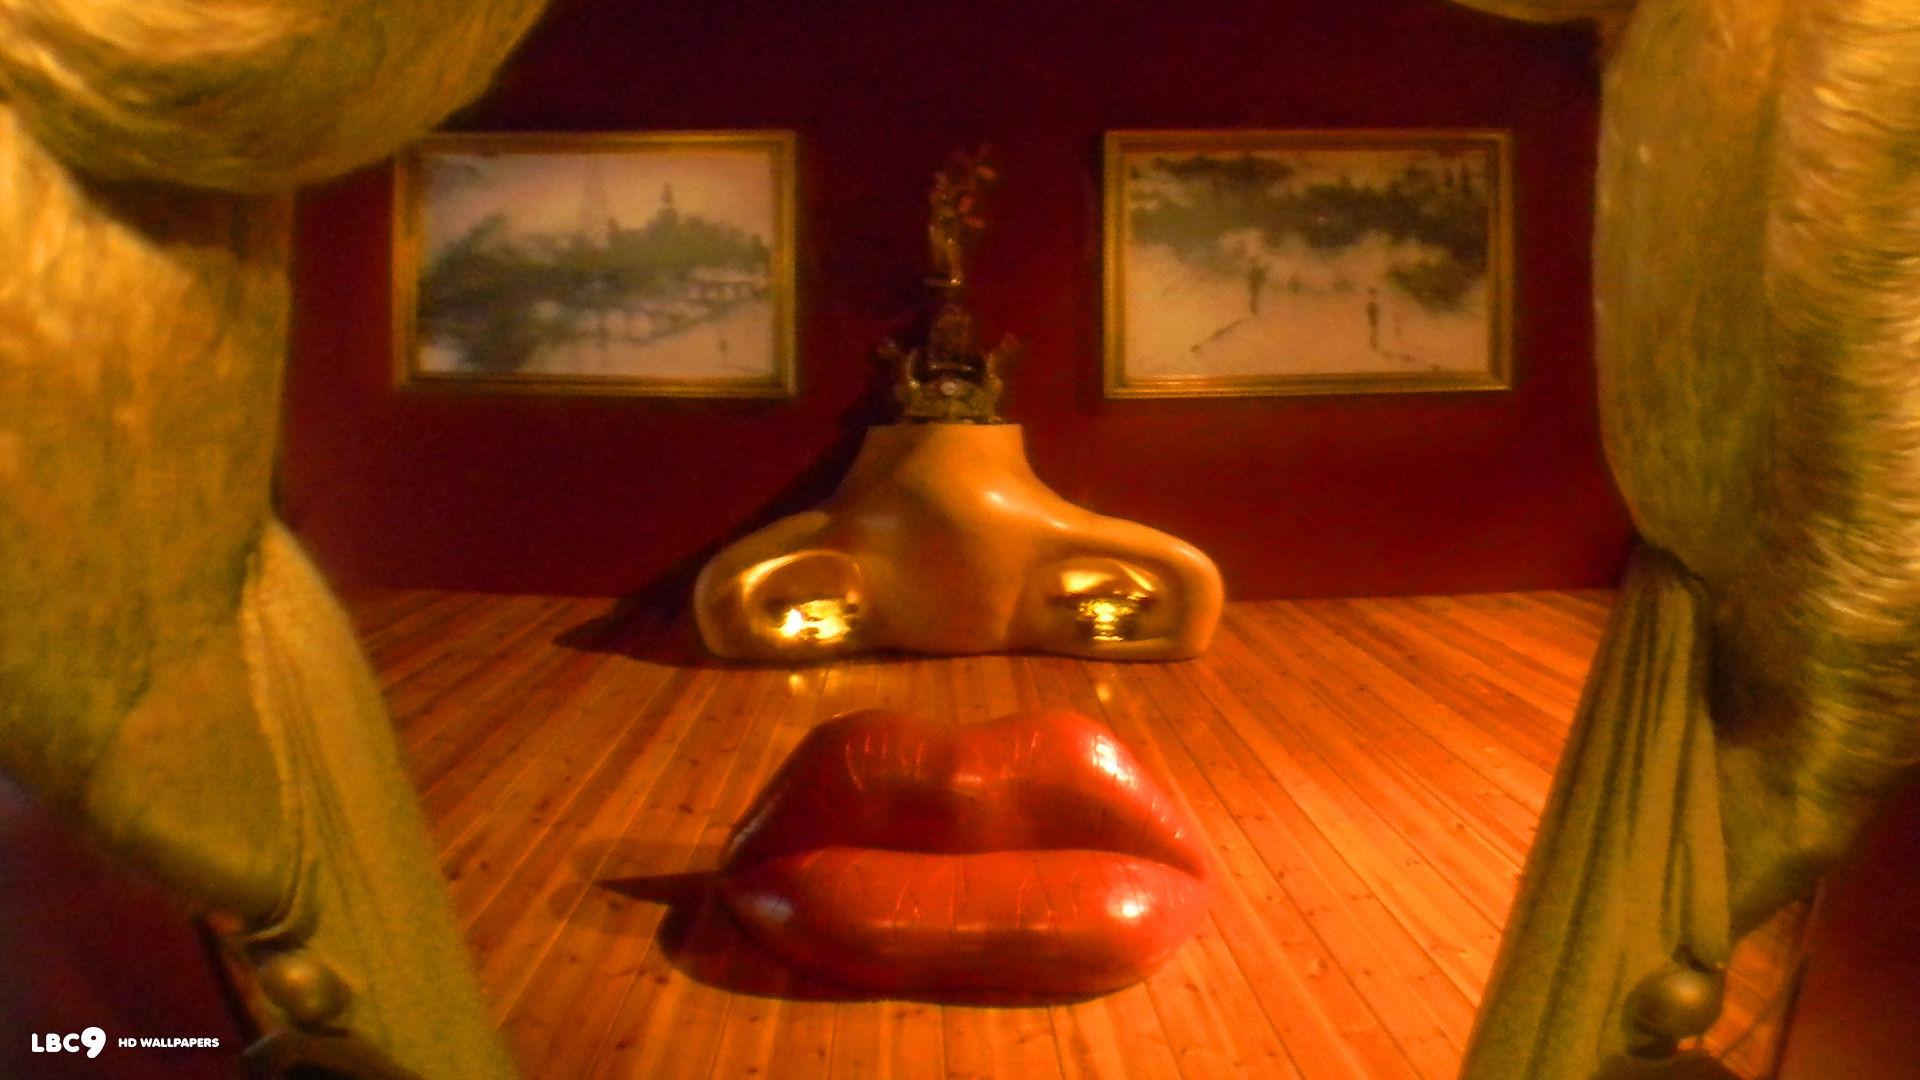 mae west lips sofa 1920×1080